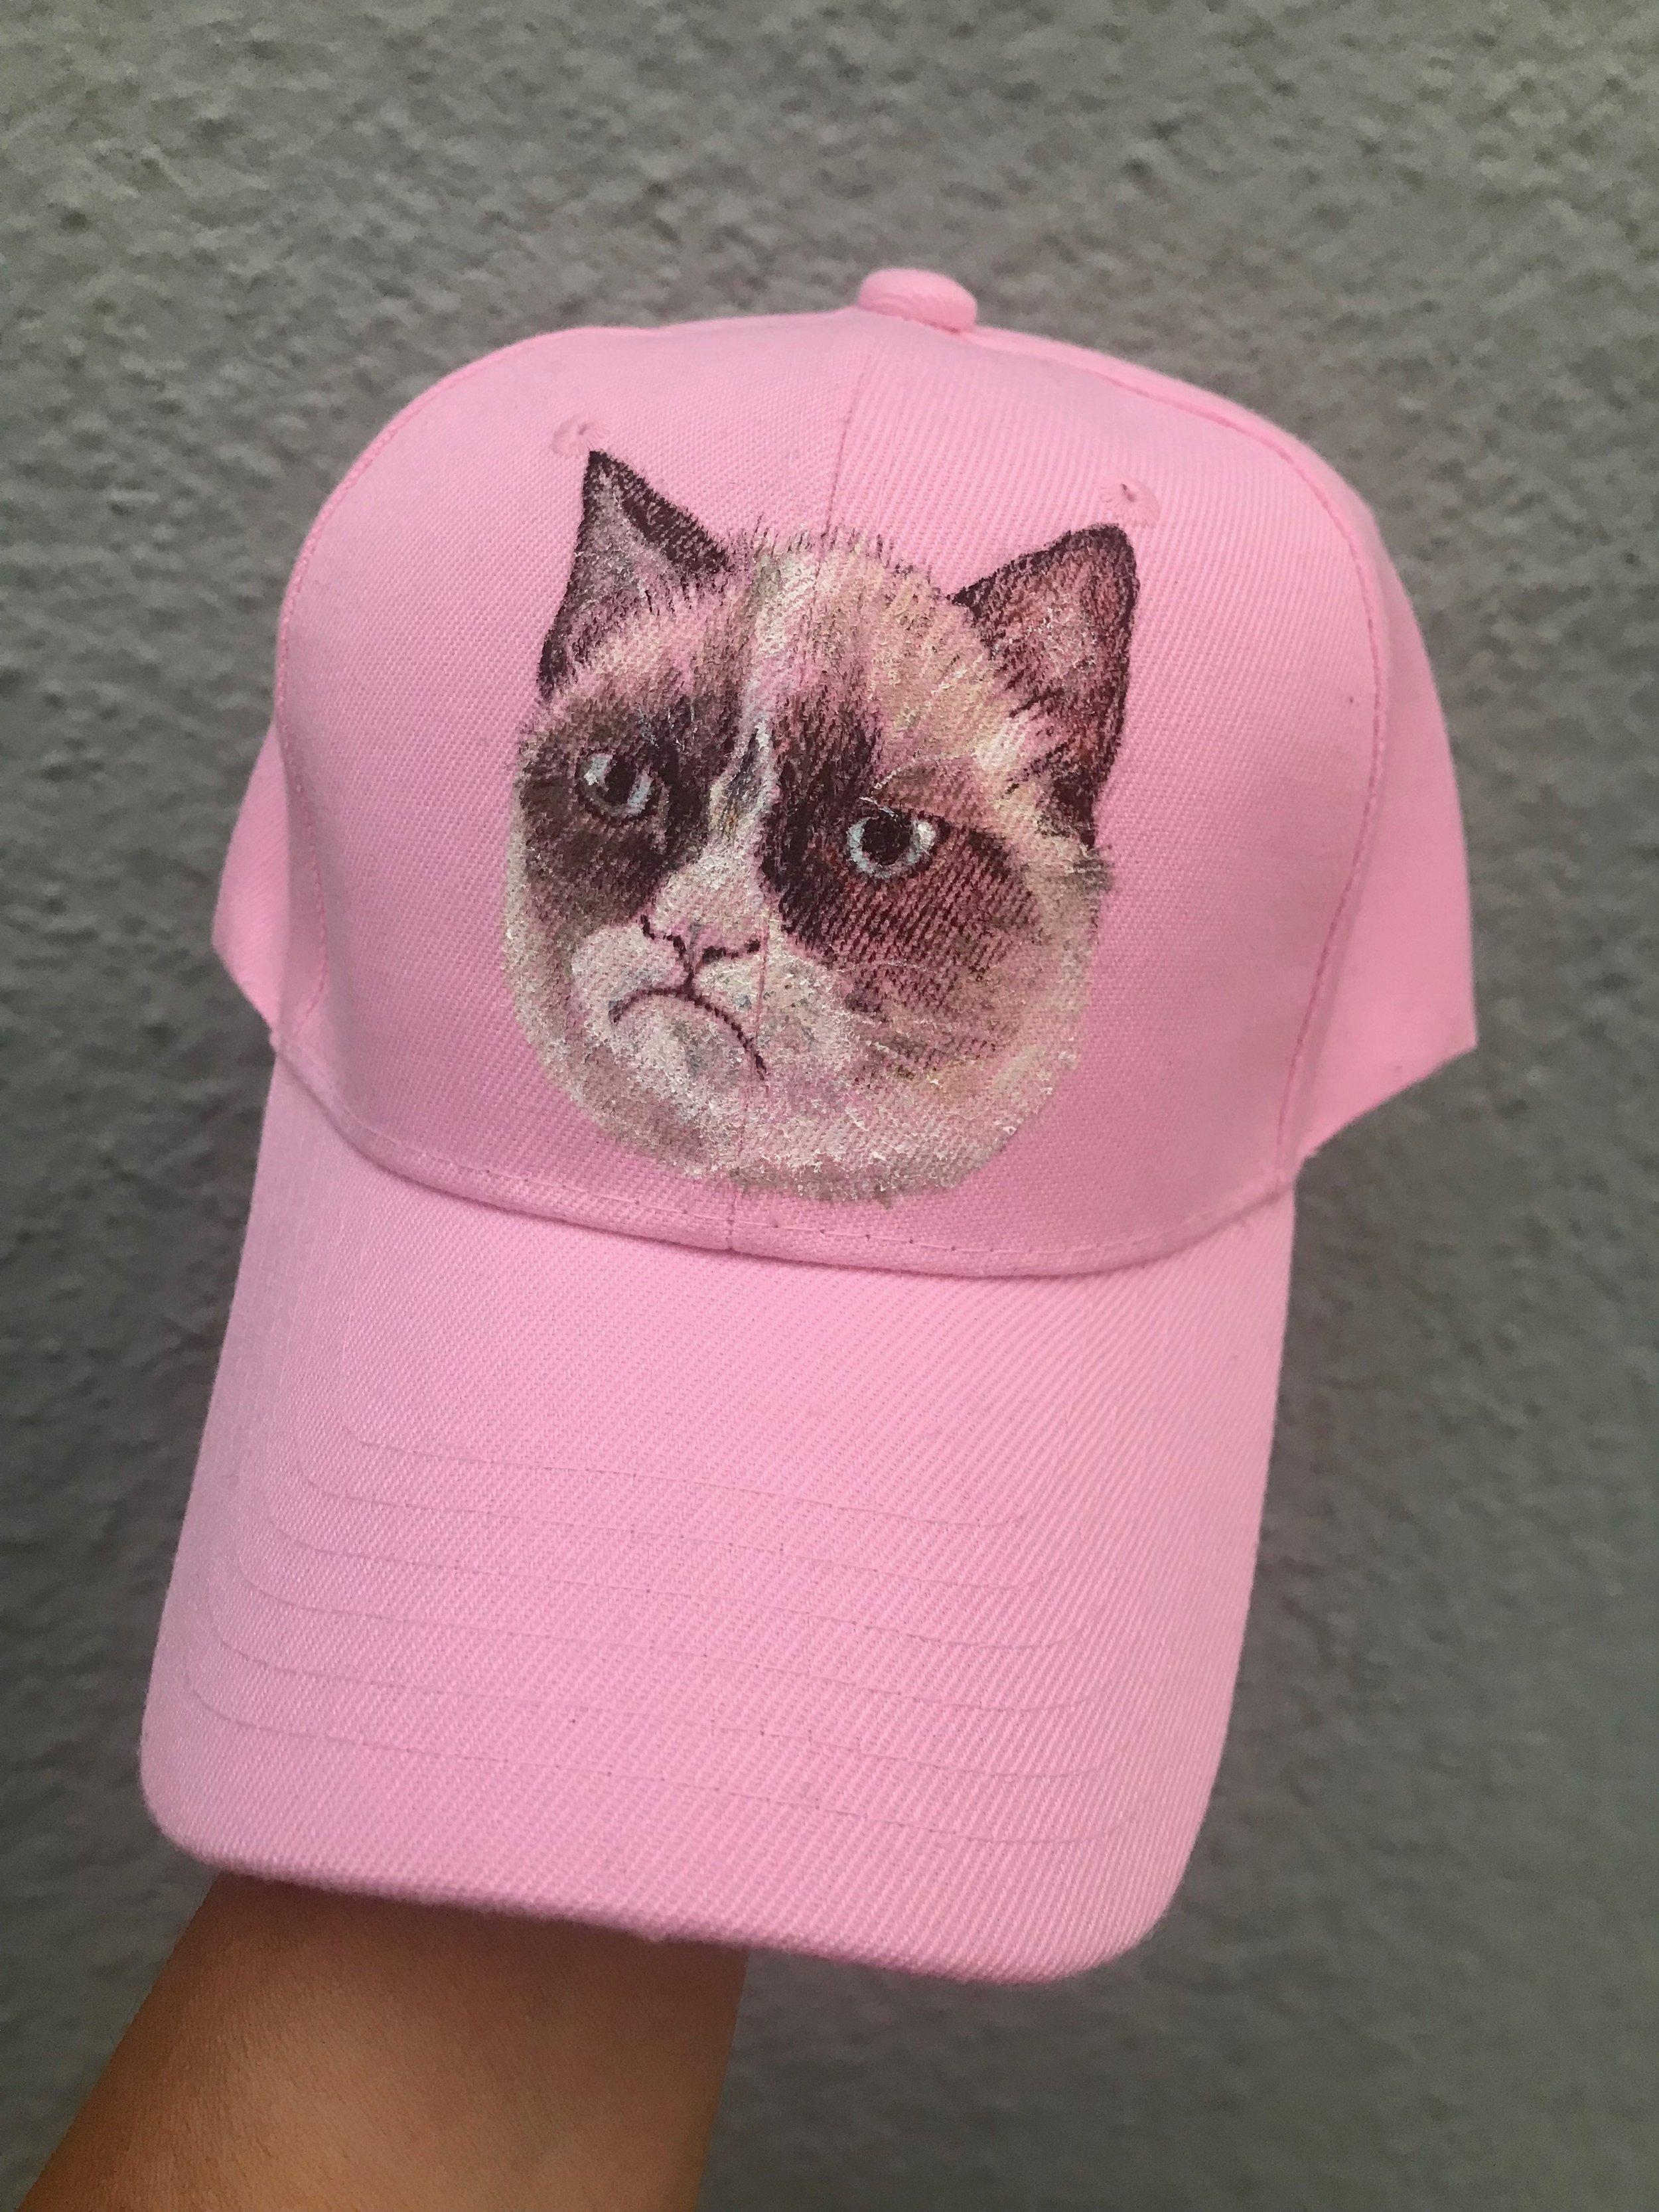 Day 313. Grumpy Cat on a Hat